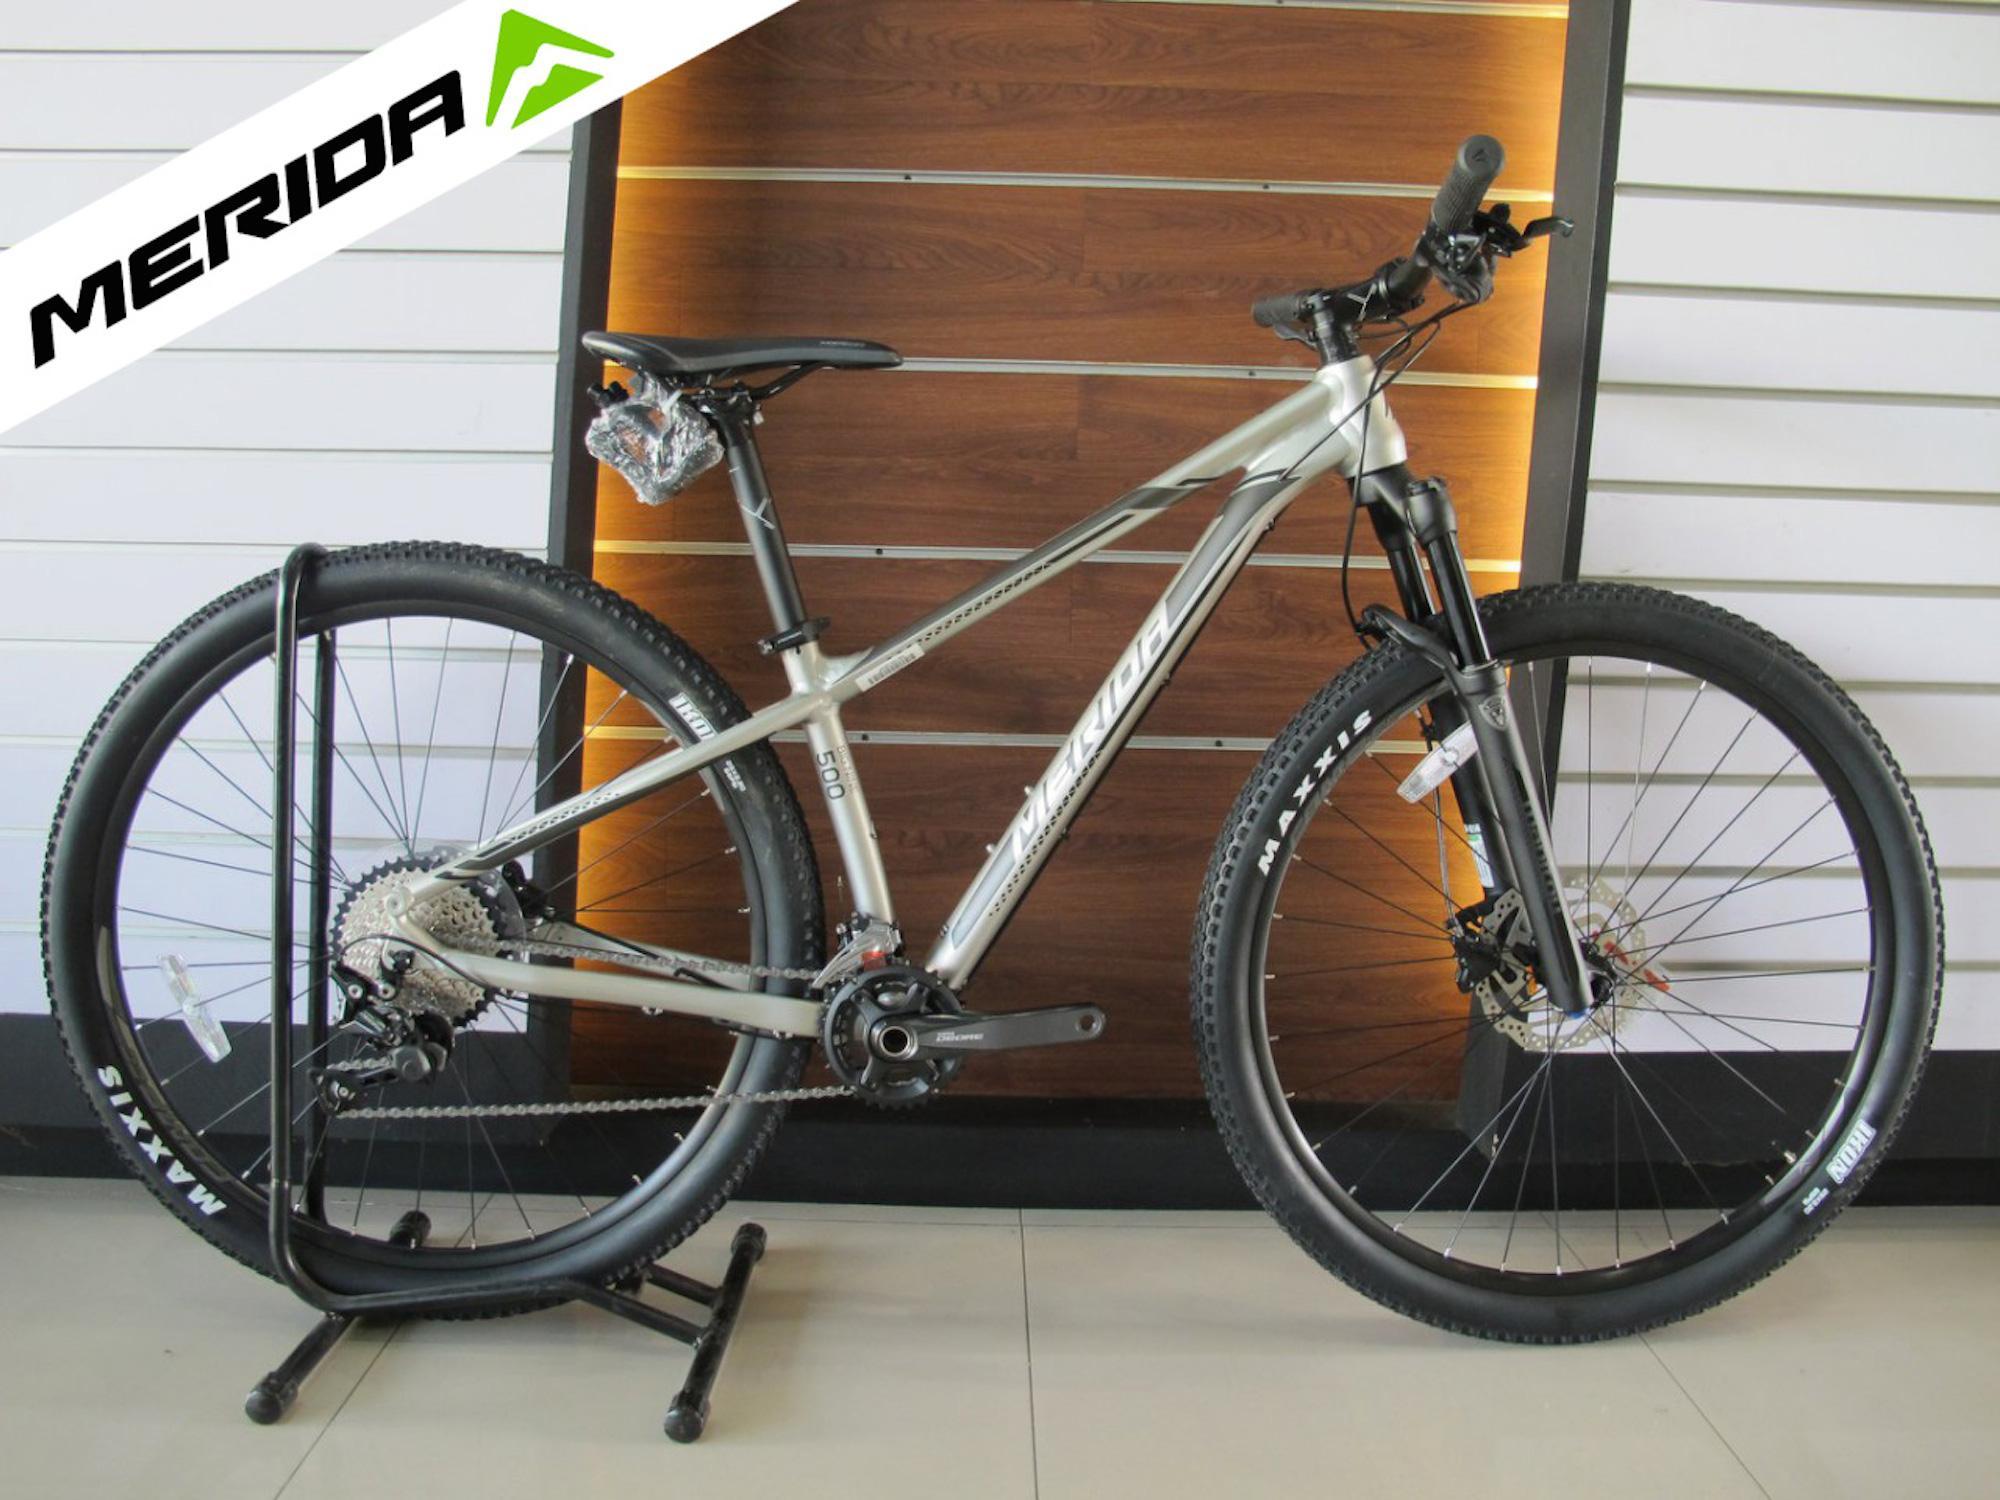 Merida Philippines: Merida price list - Merida Bicycles for sale